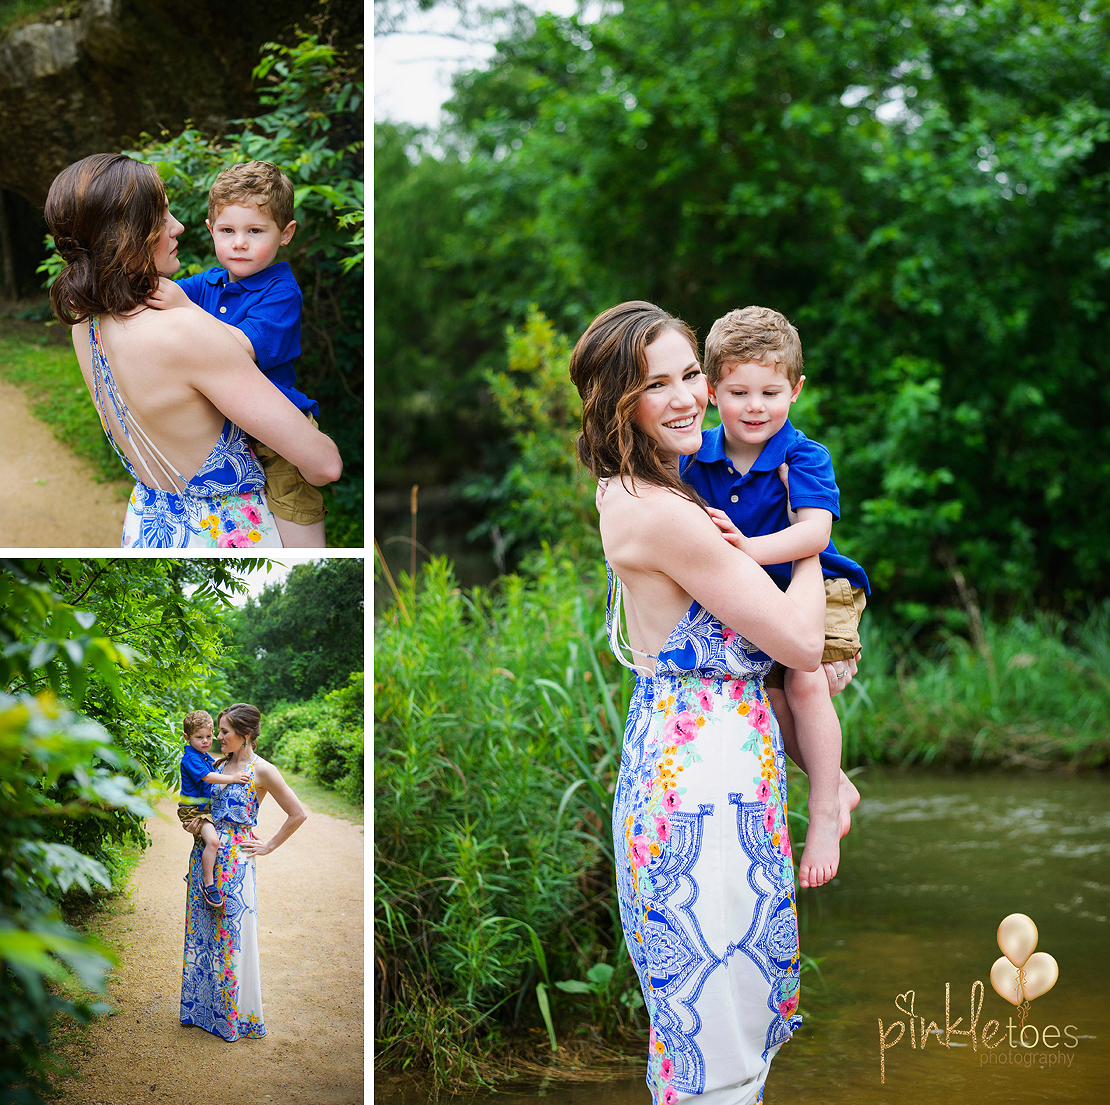 cedar-park-family-lifestyle-photography-texas-wildflowers-014